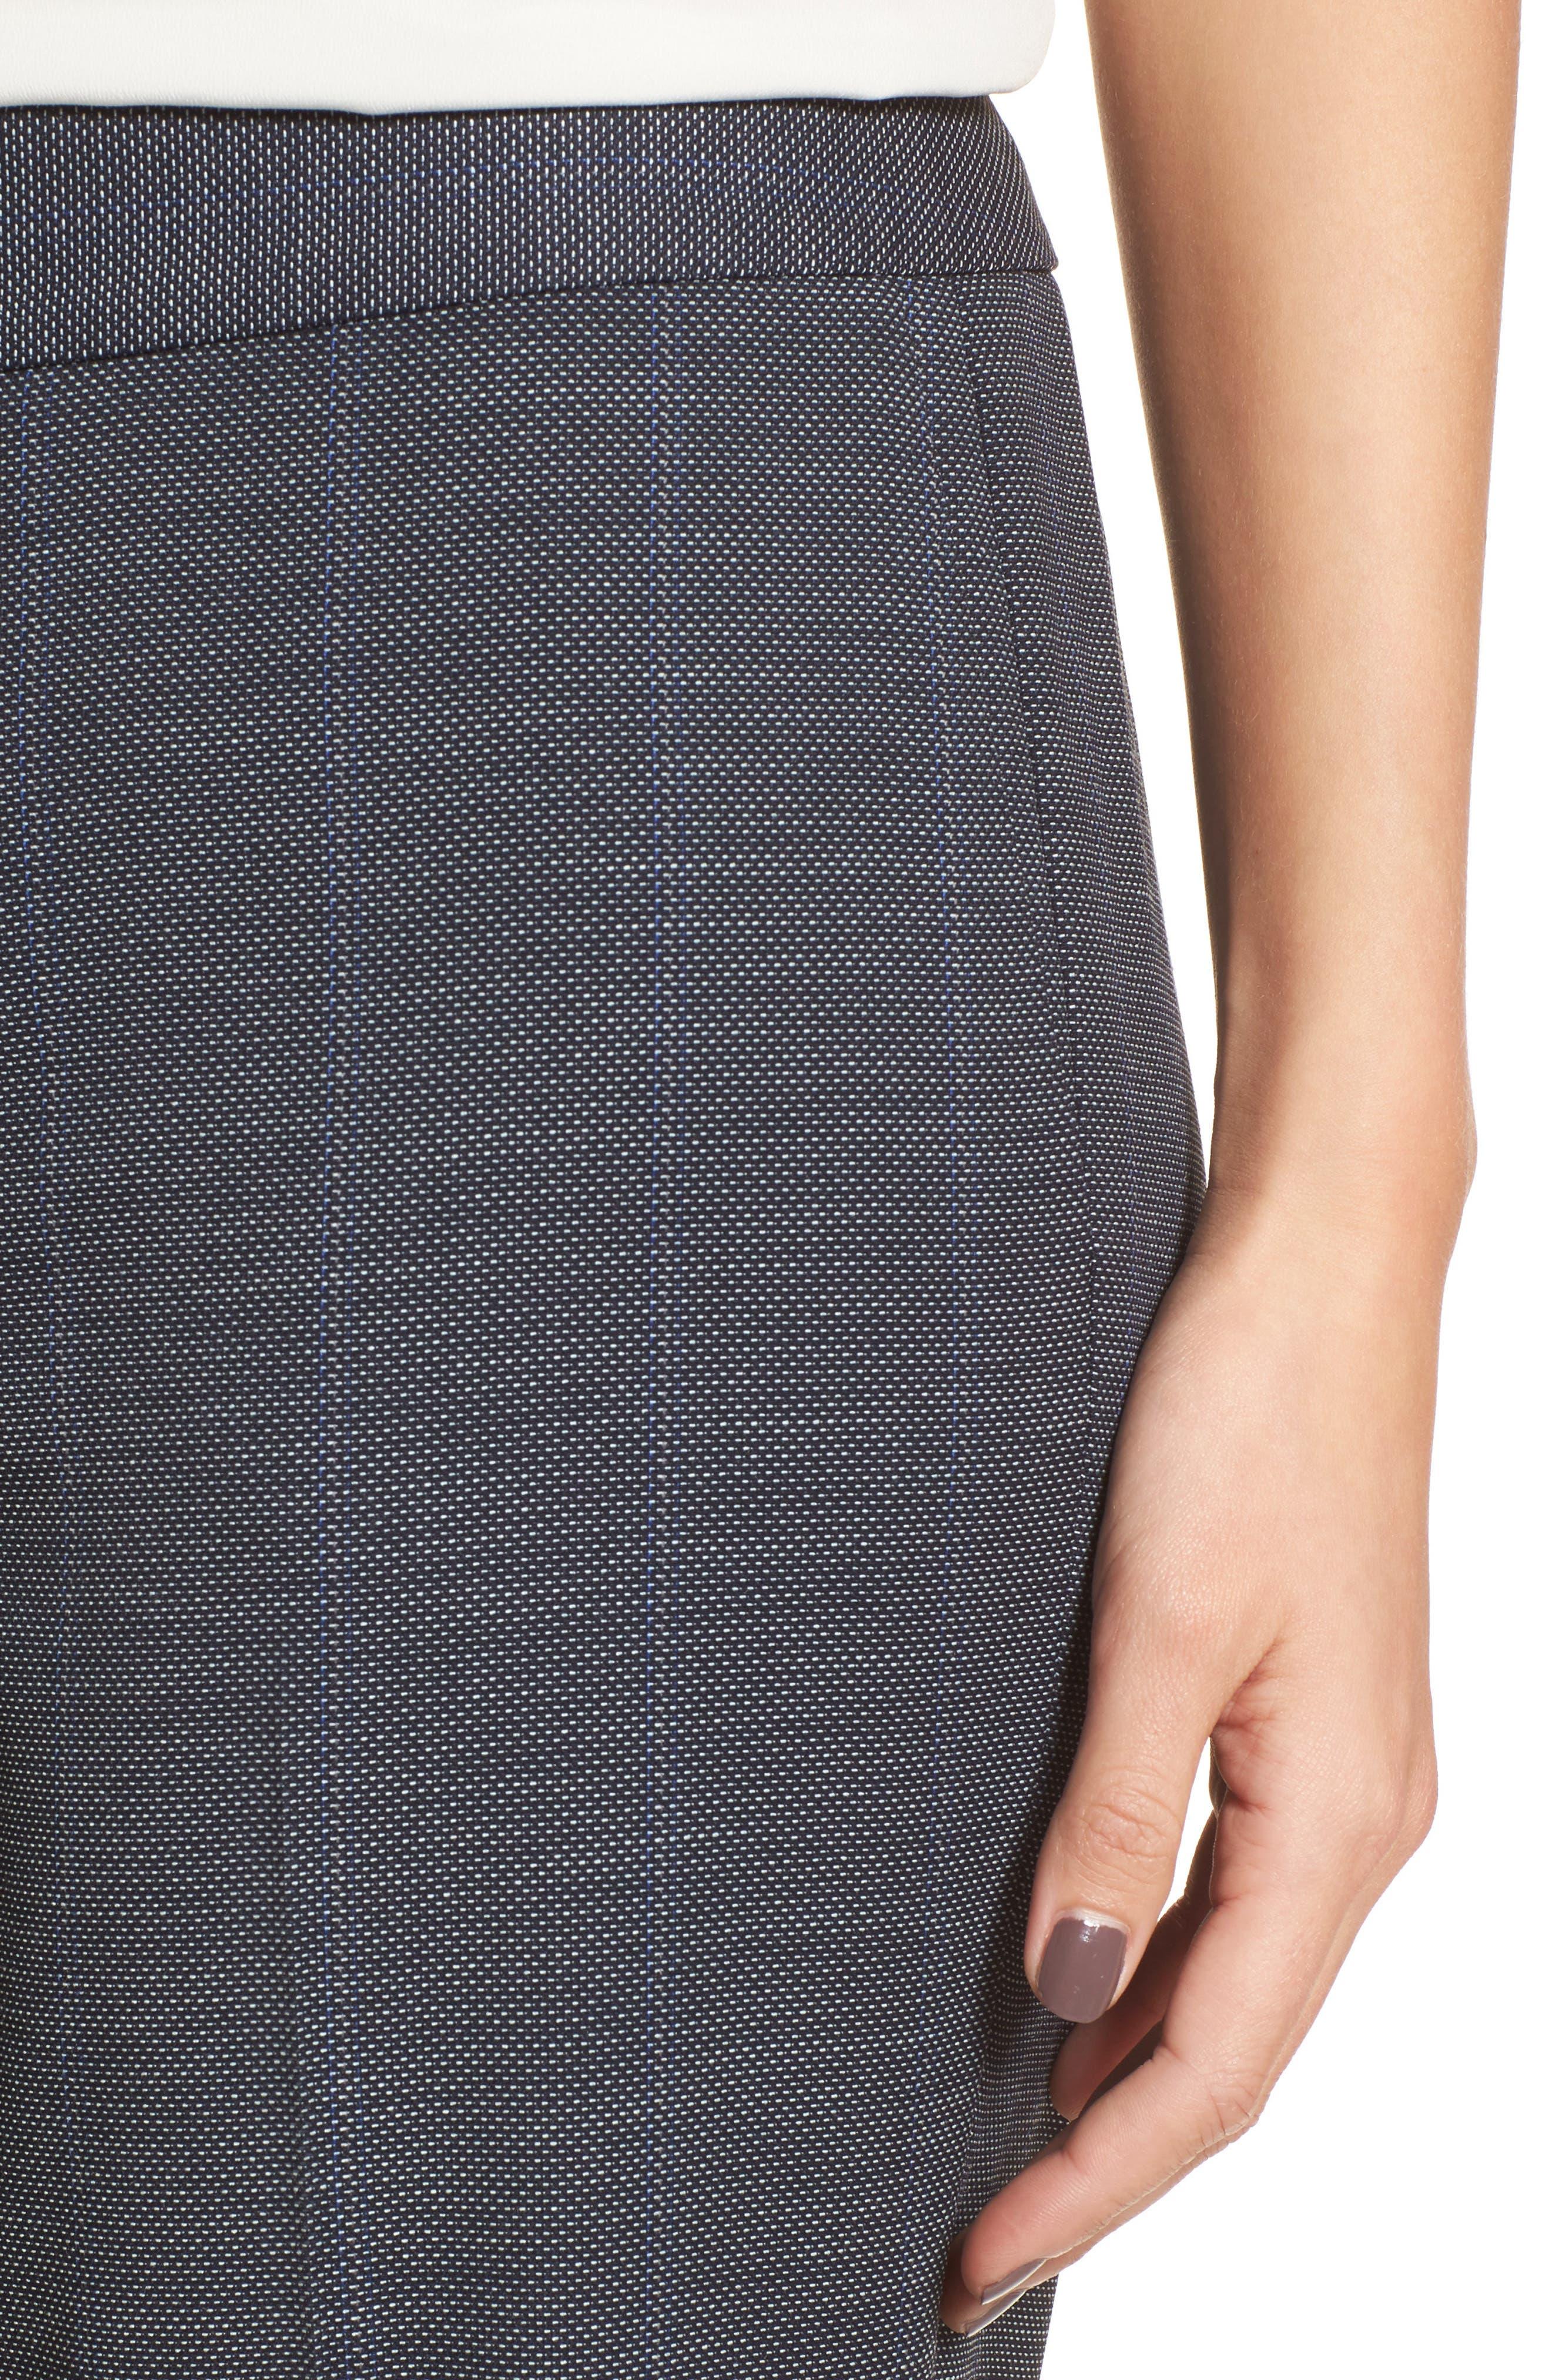 Cross Dye Suit Pants,                             Alternate thumbnail 4, color,                             Navy Crossdye Pattern